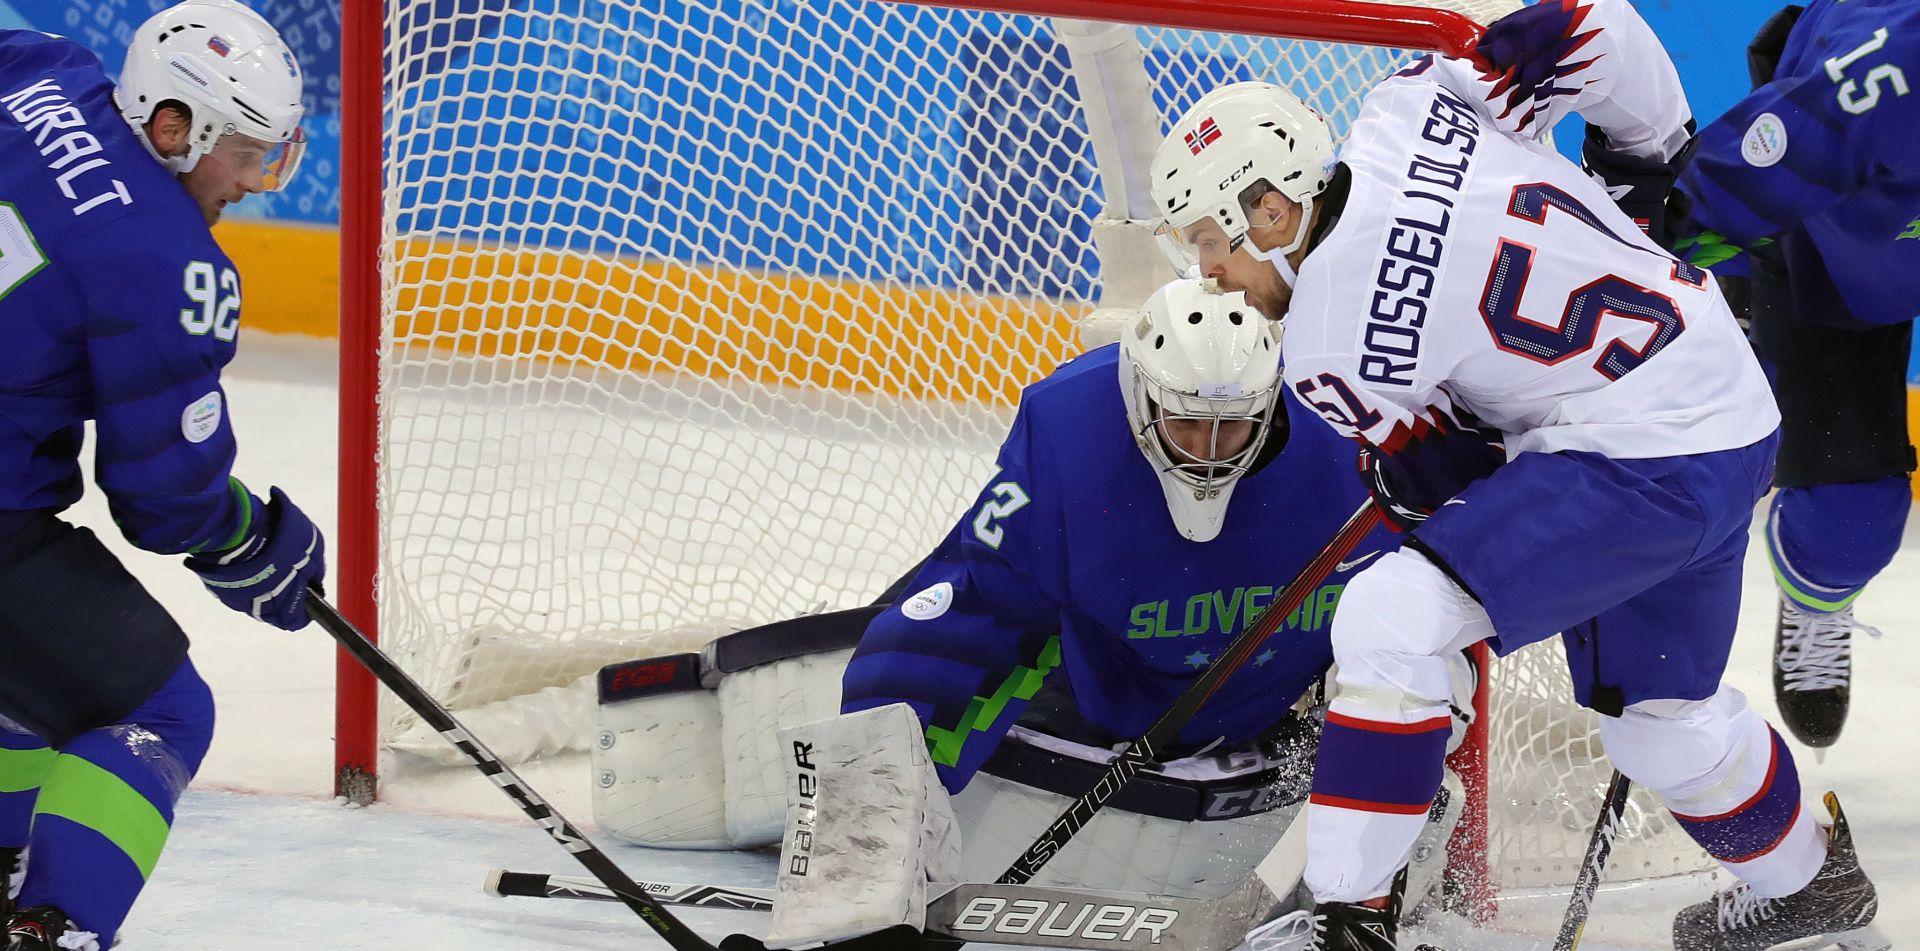 ZOI Hokejaši Norveške izbacili Slovence